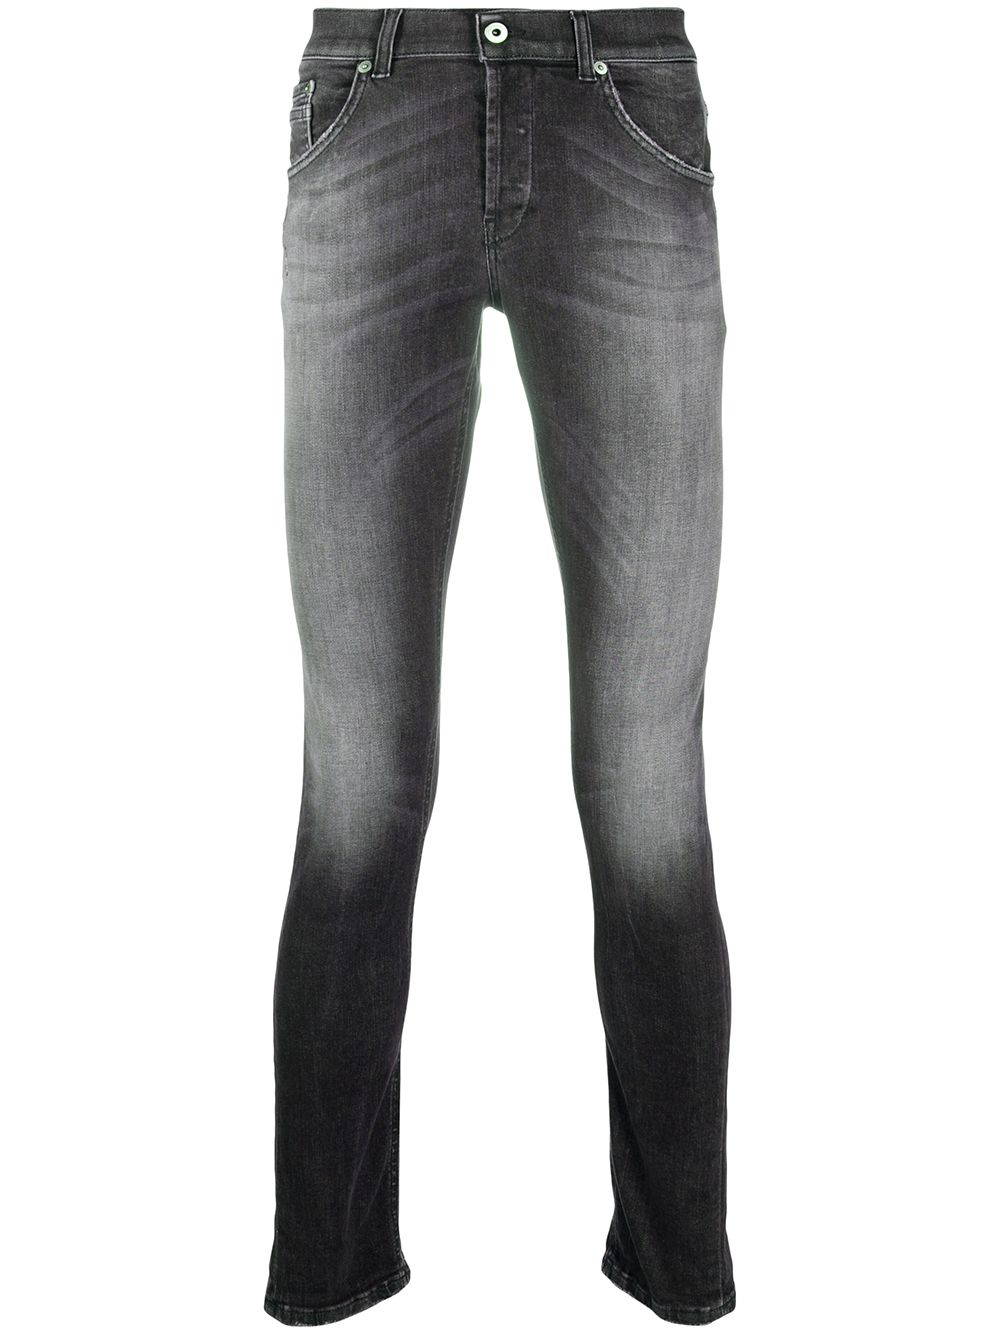 Ritchie Denim Jeans